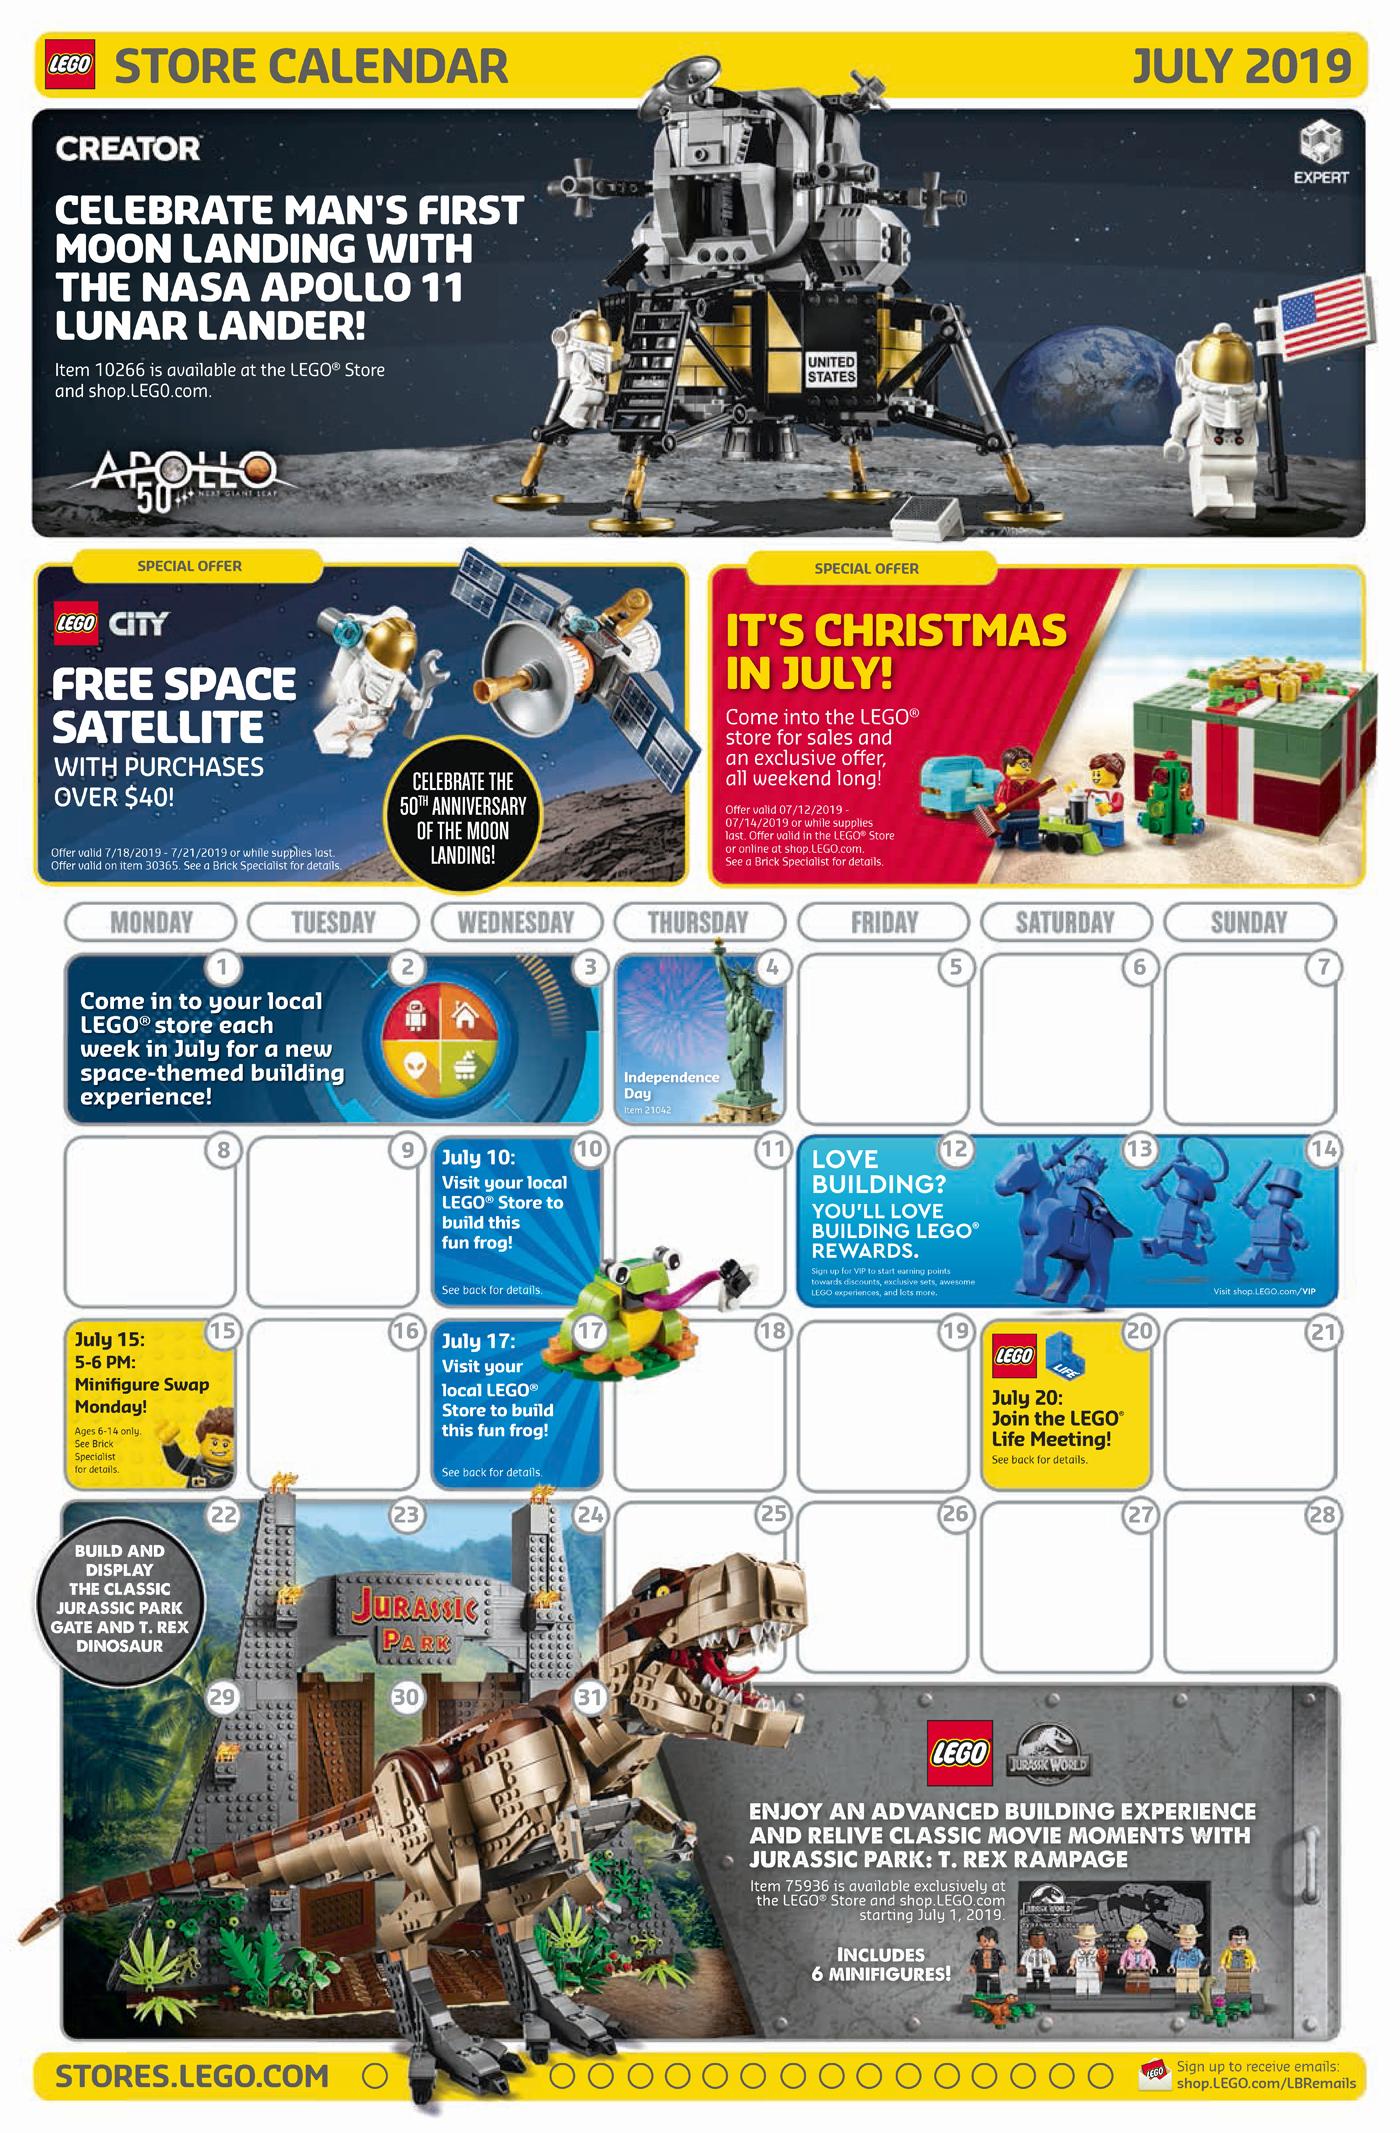 Lego June 2021 Calendar July 2019 LEGO Store Calendar Highlights and Promotions